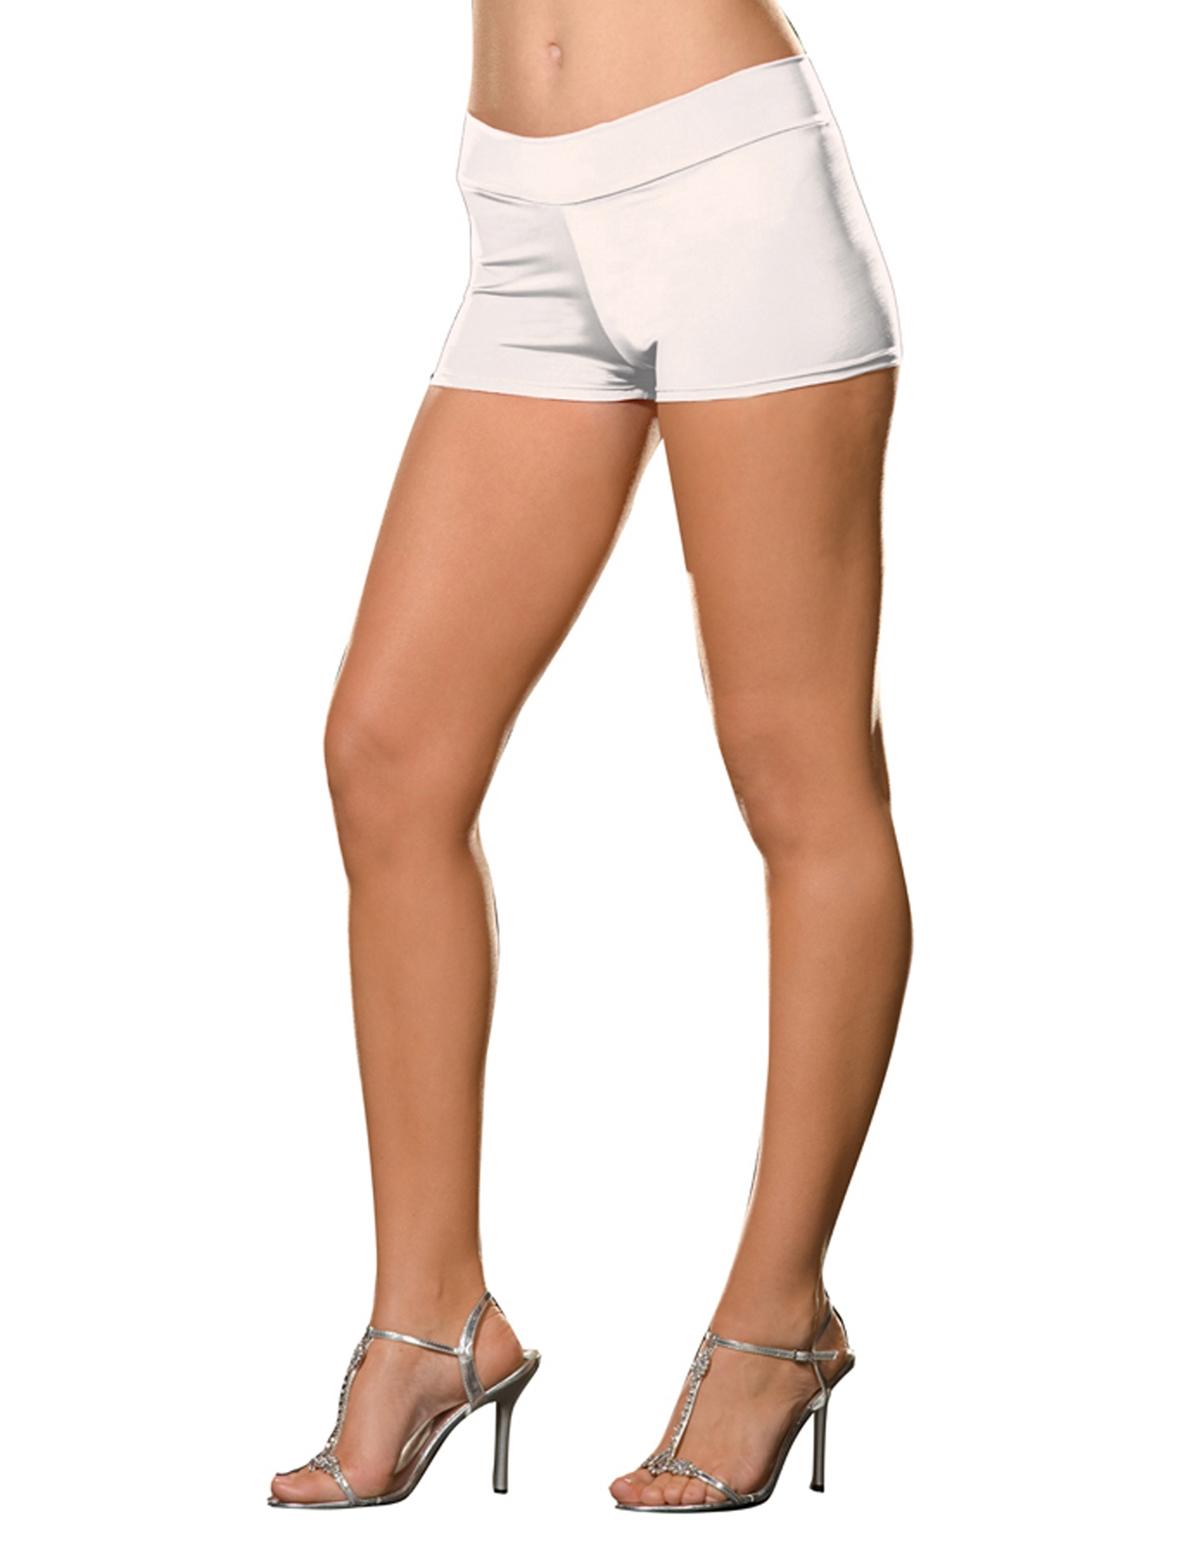 Roxie Hot Short - Plus